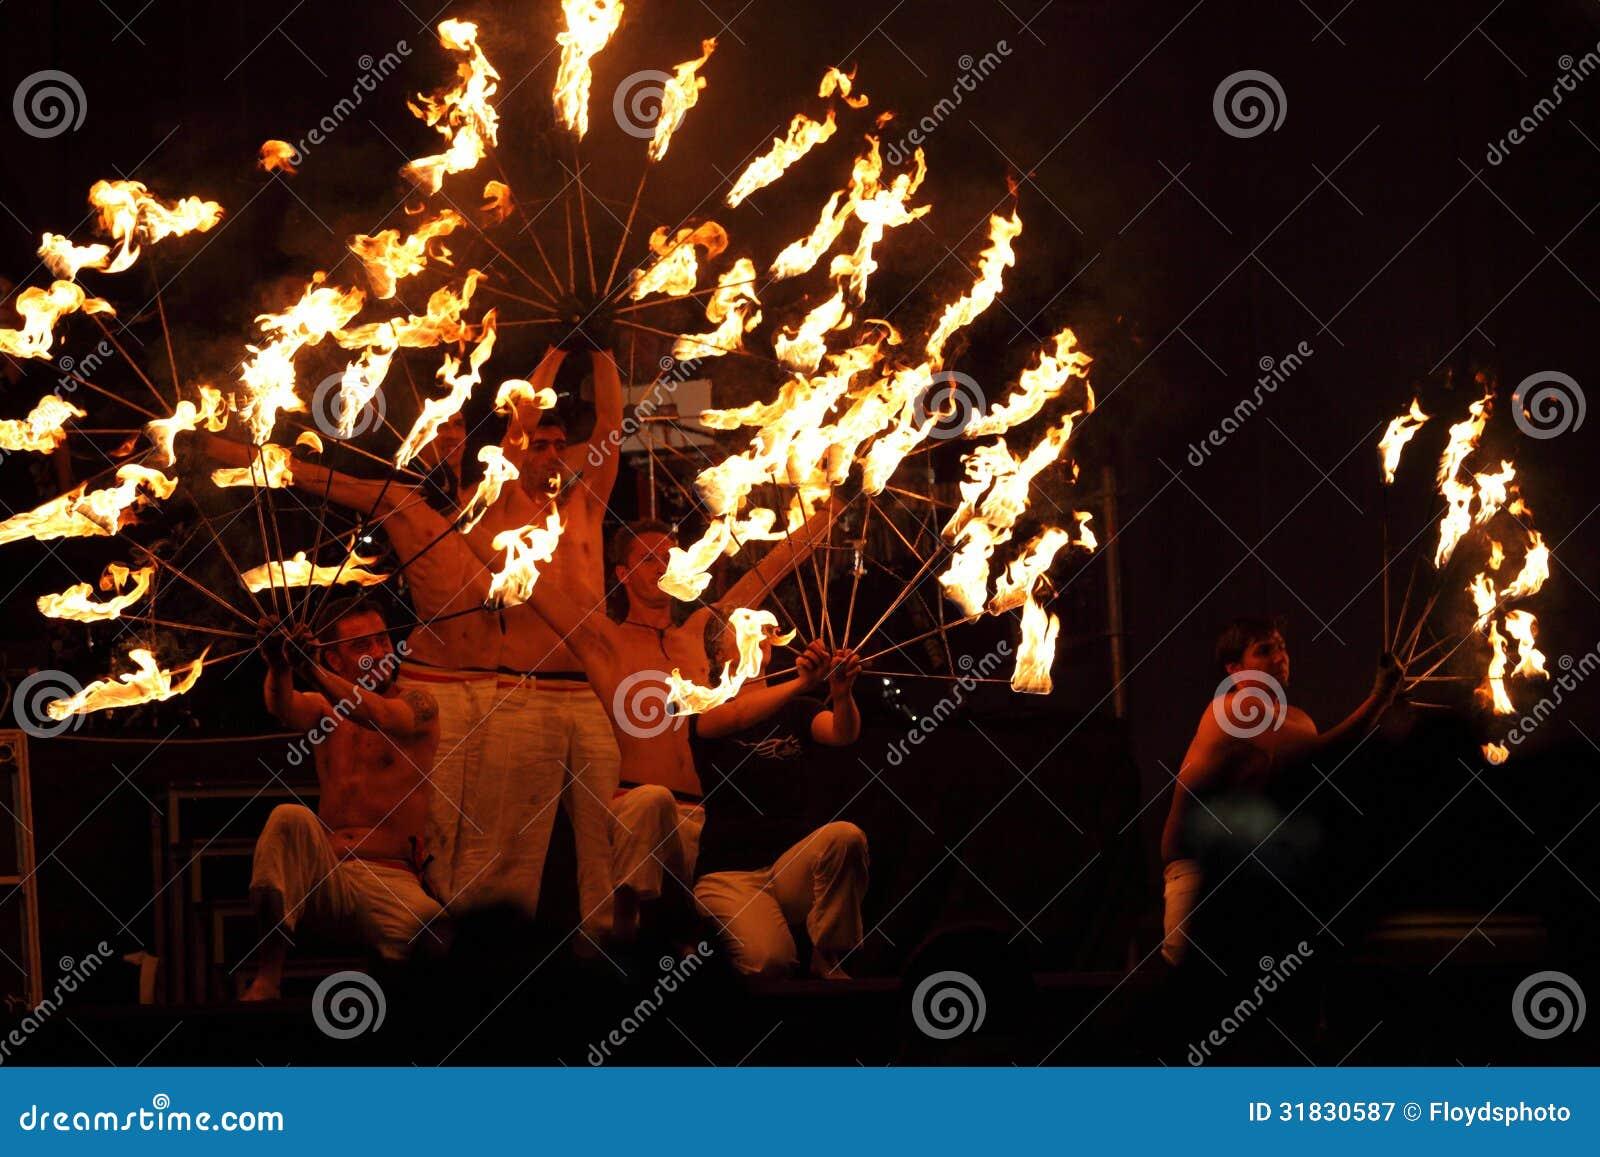 Beautiful burning torches setting